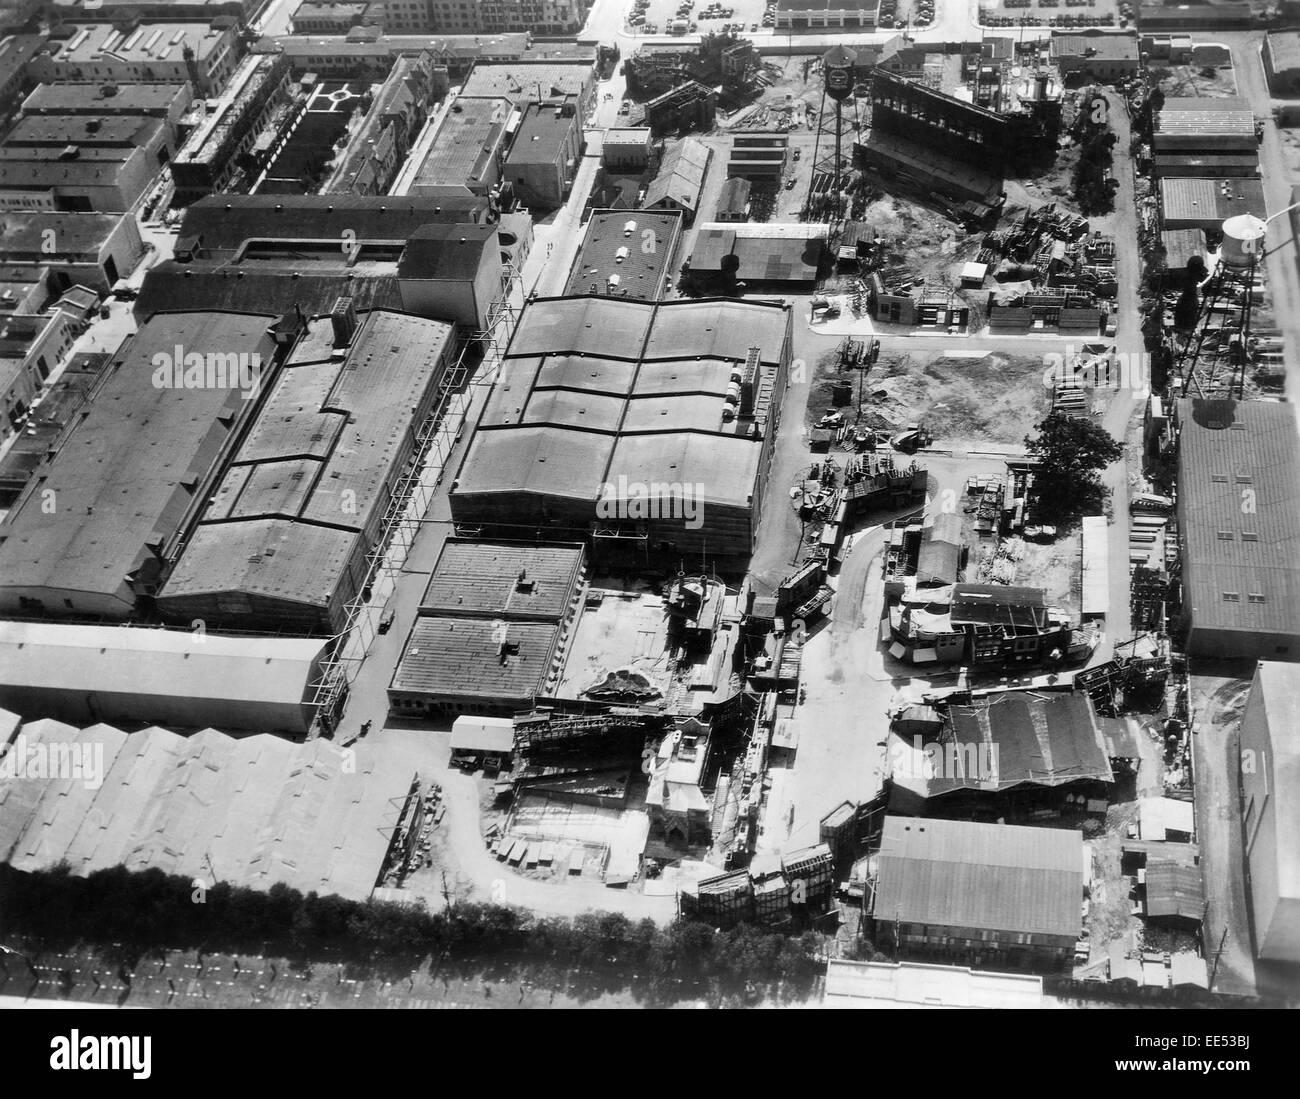 Paramount Studios, High Angle View, Los Angeles, California, USA, 1933 - Stock Image